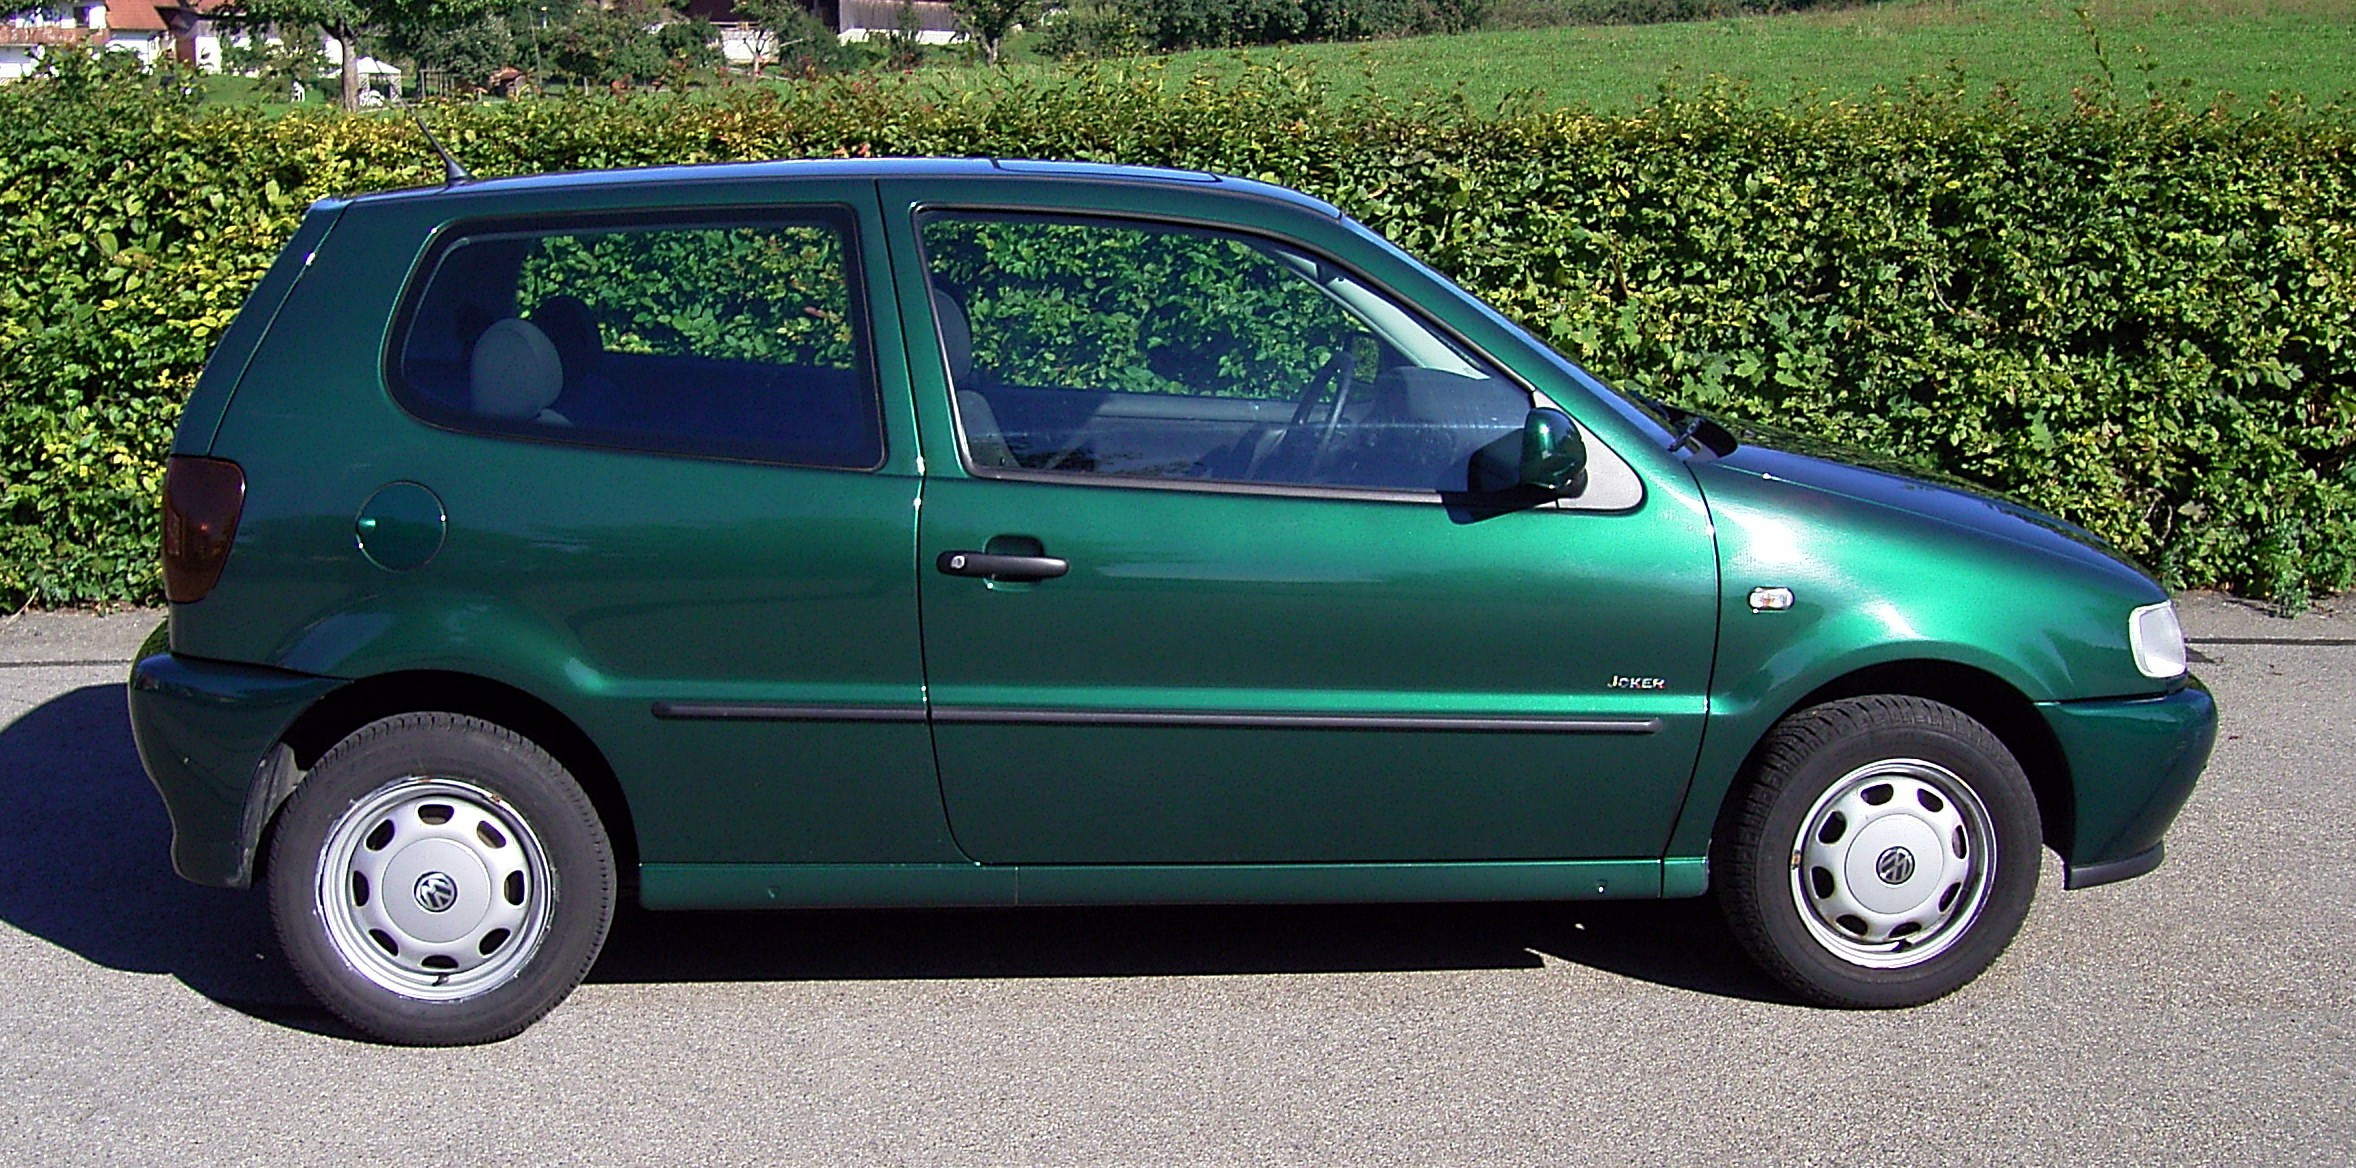 File:VW Polo 6N (Side).jpg - Wikimedia Commons